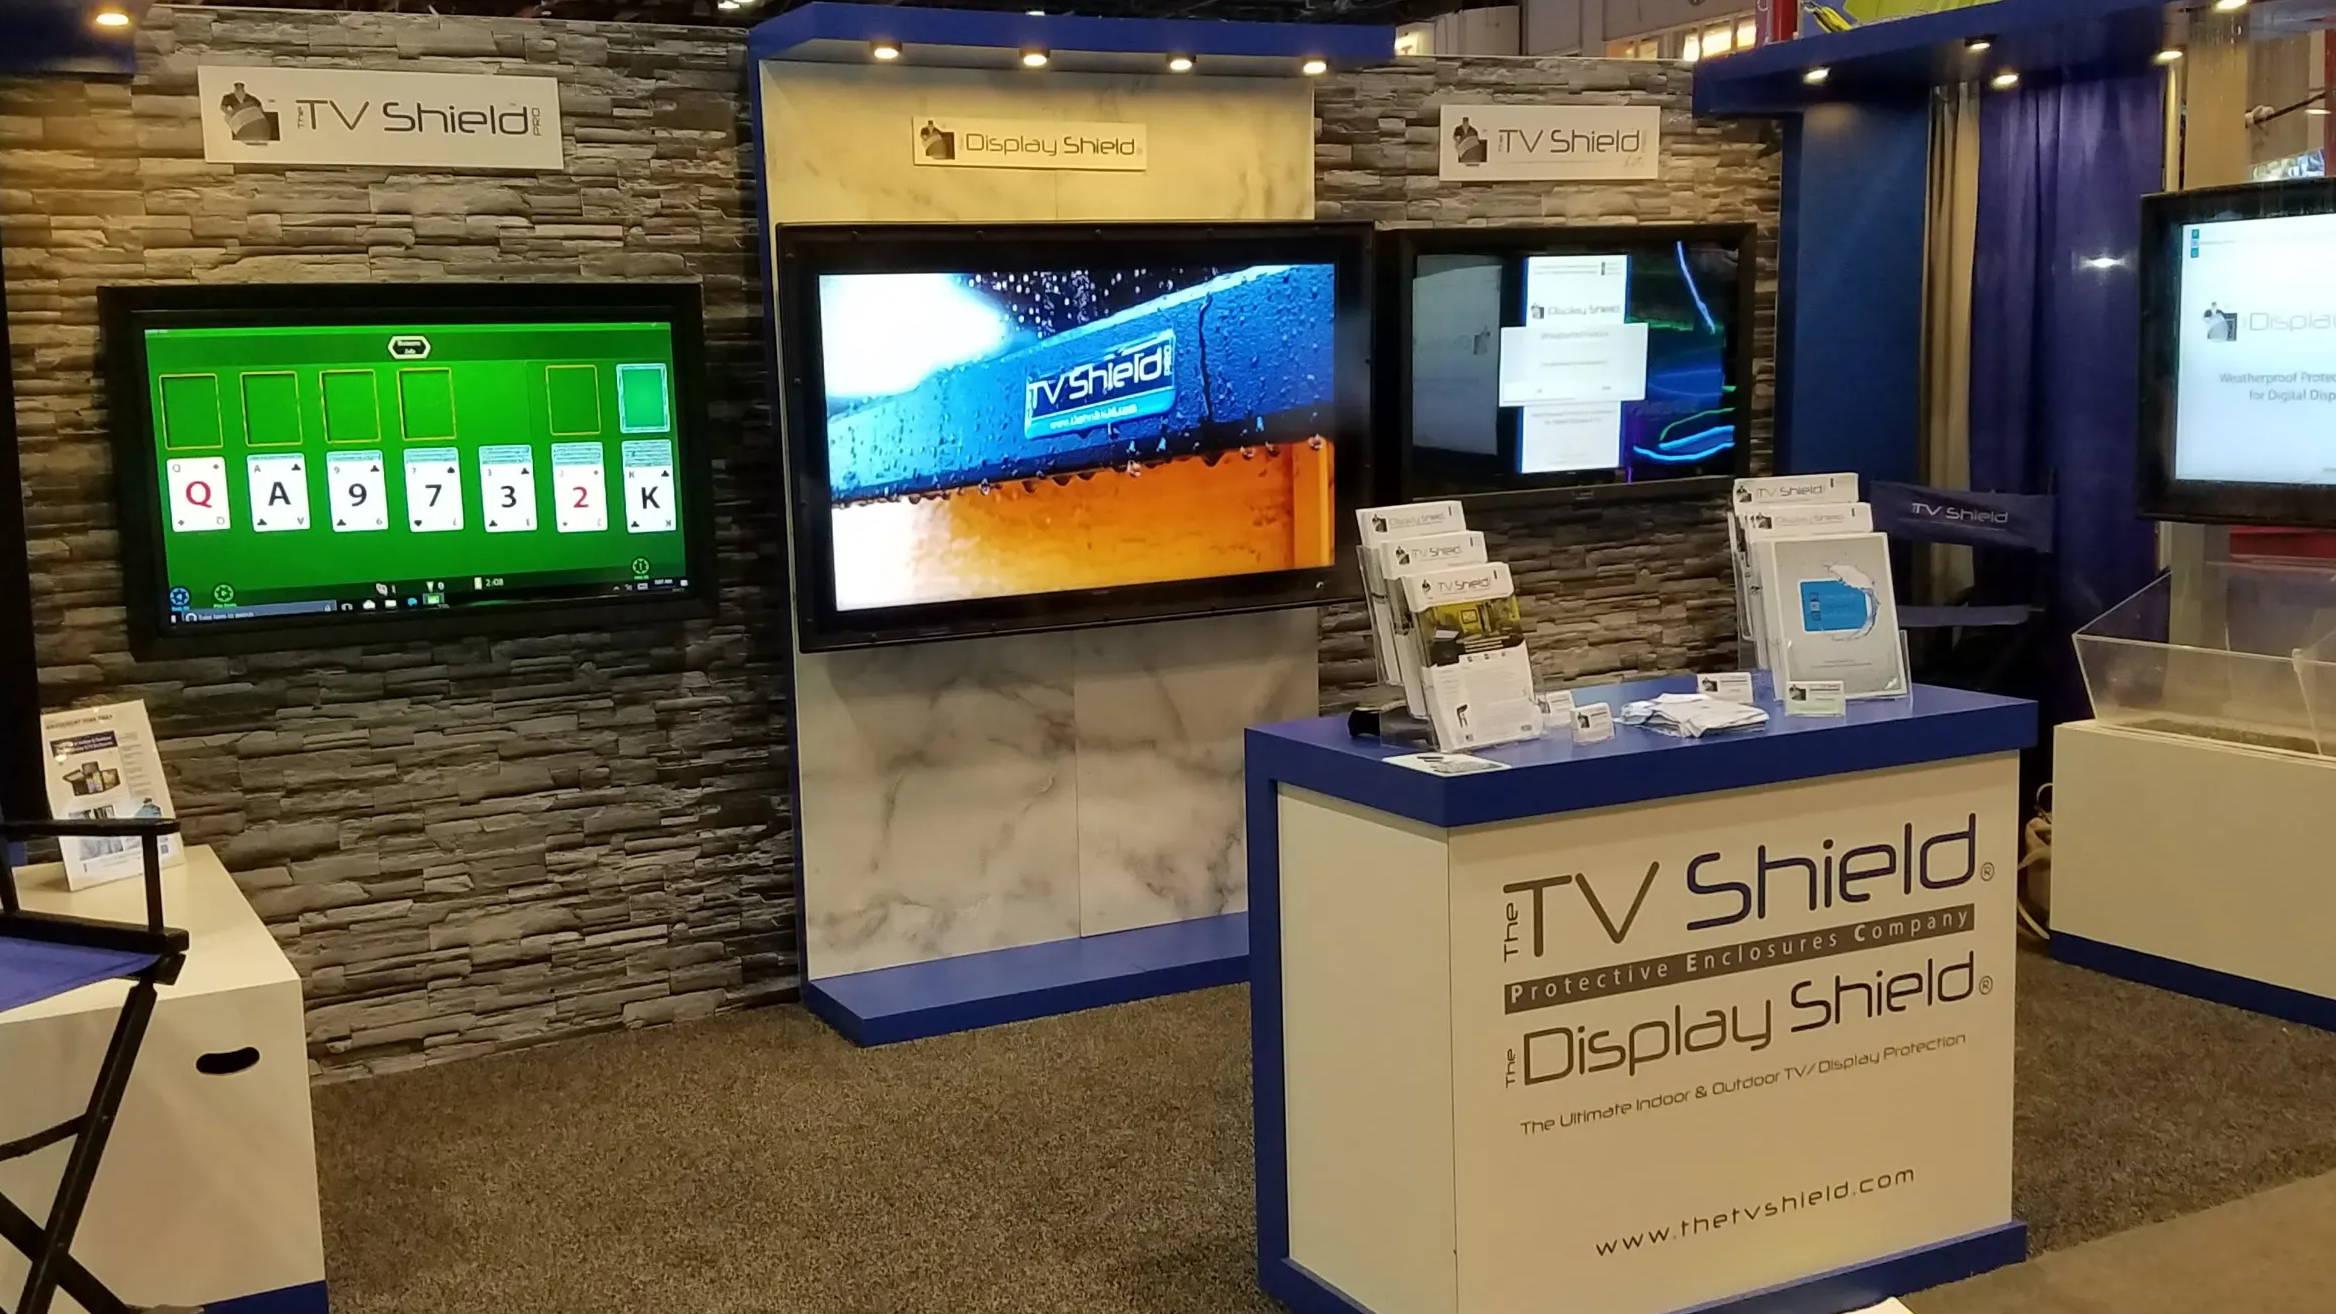 The TV Shield, The Display Shield, The TV Shield PRO outdoor TV enclosure solutions